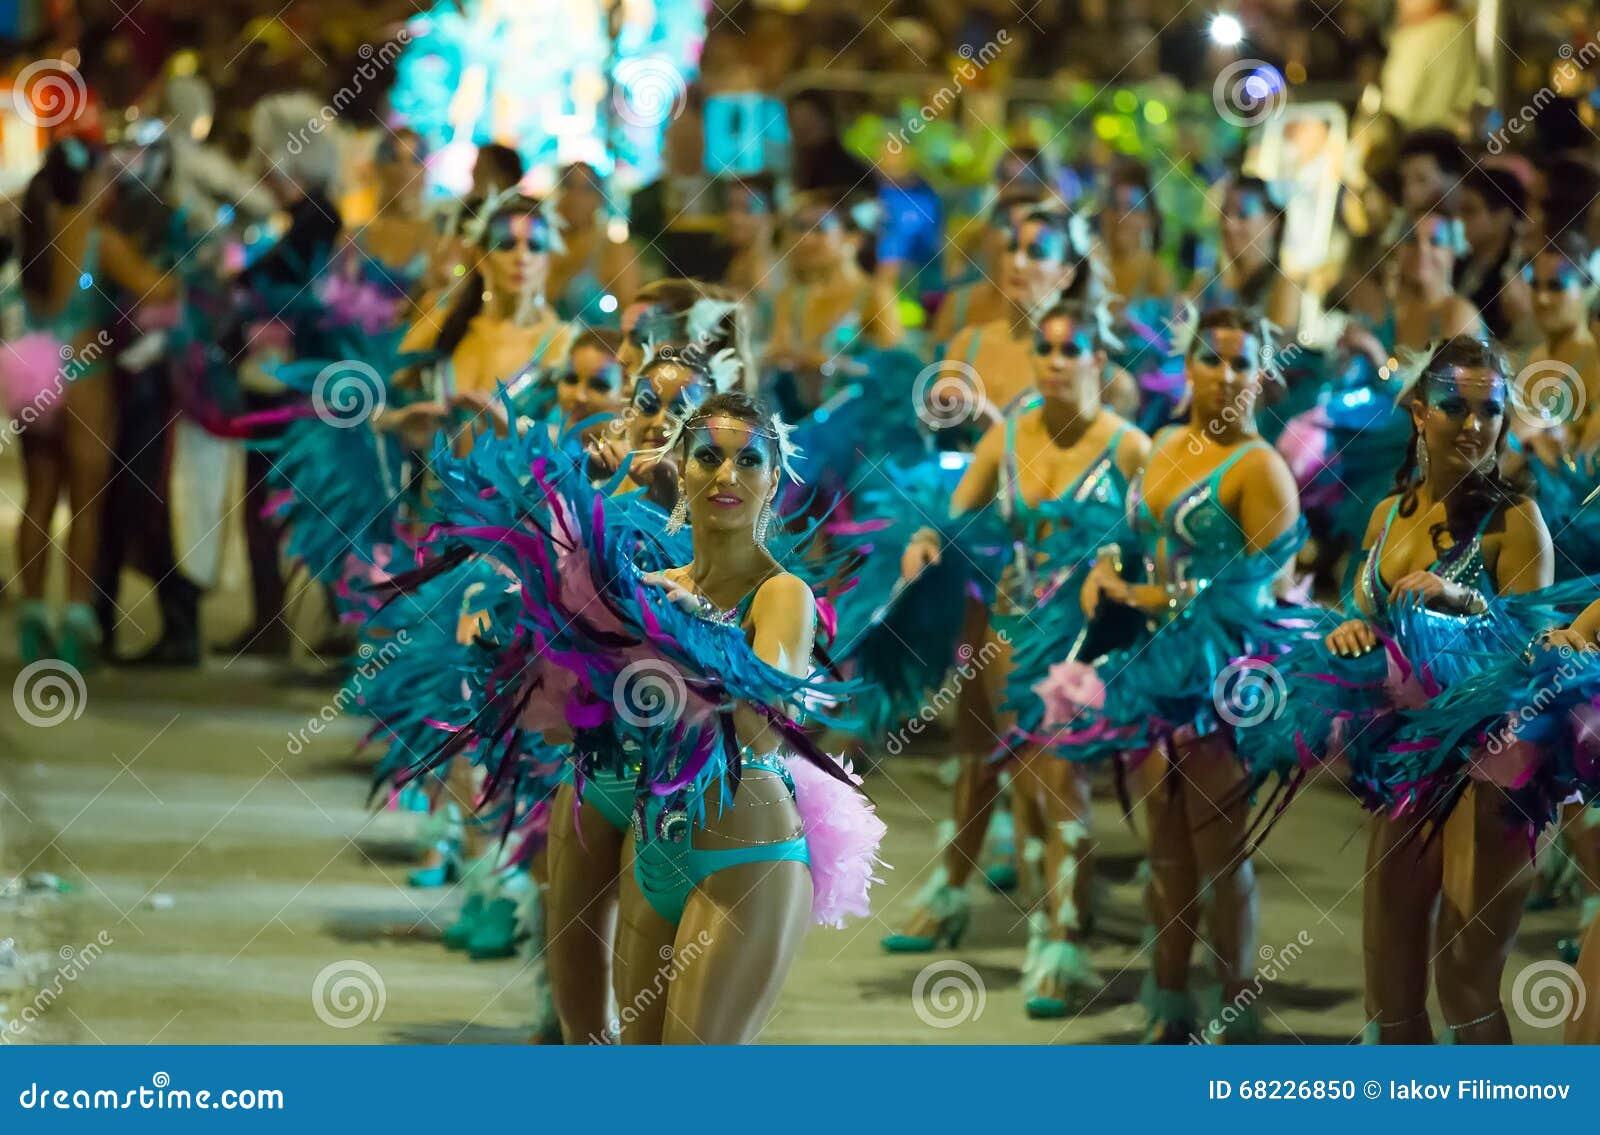 Carnaval espagnol dans la soirée